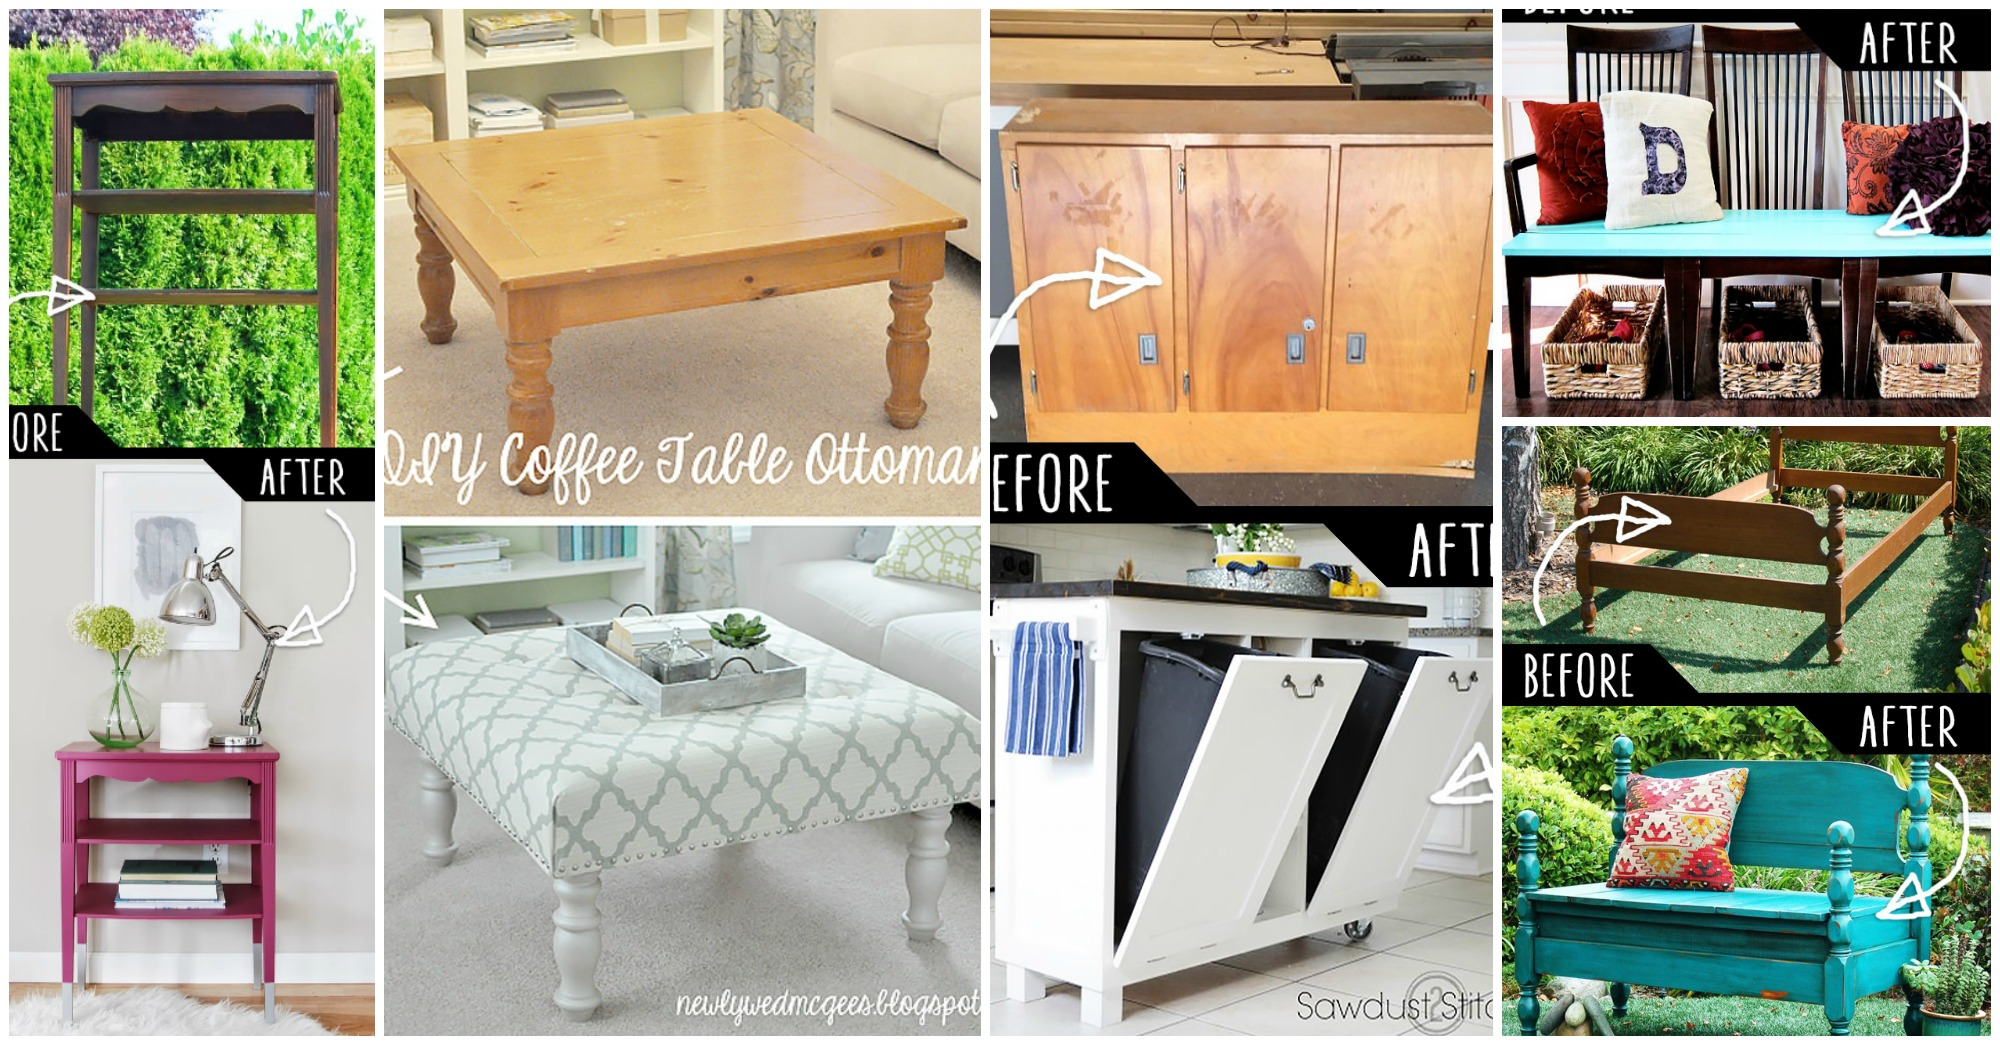 repurpose old furniture. Repurpose Old Furniture Decorating HQ